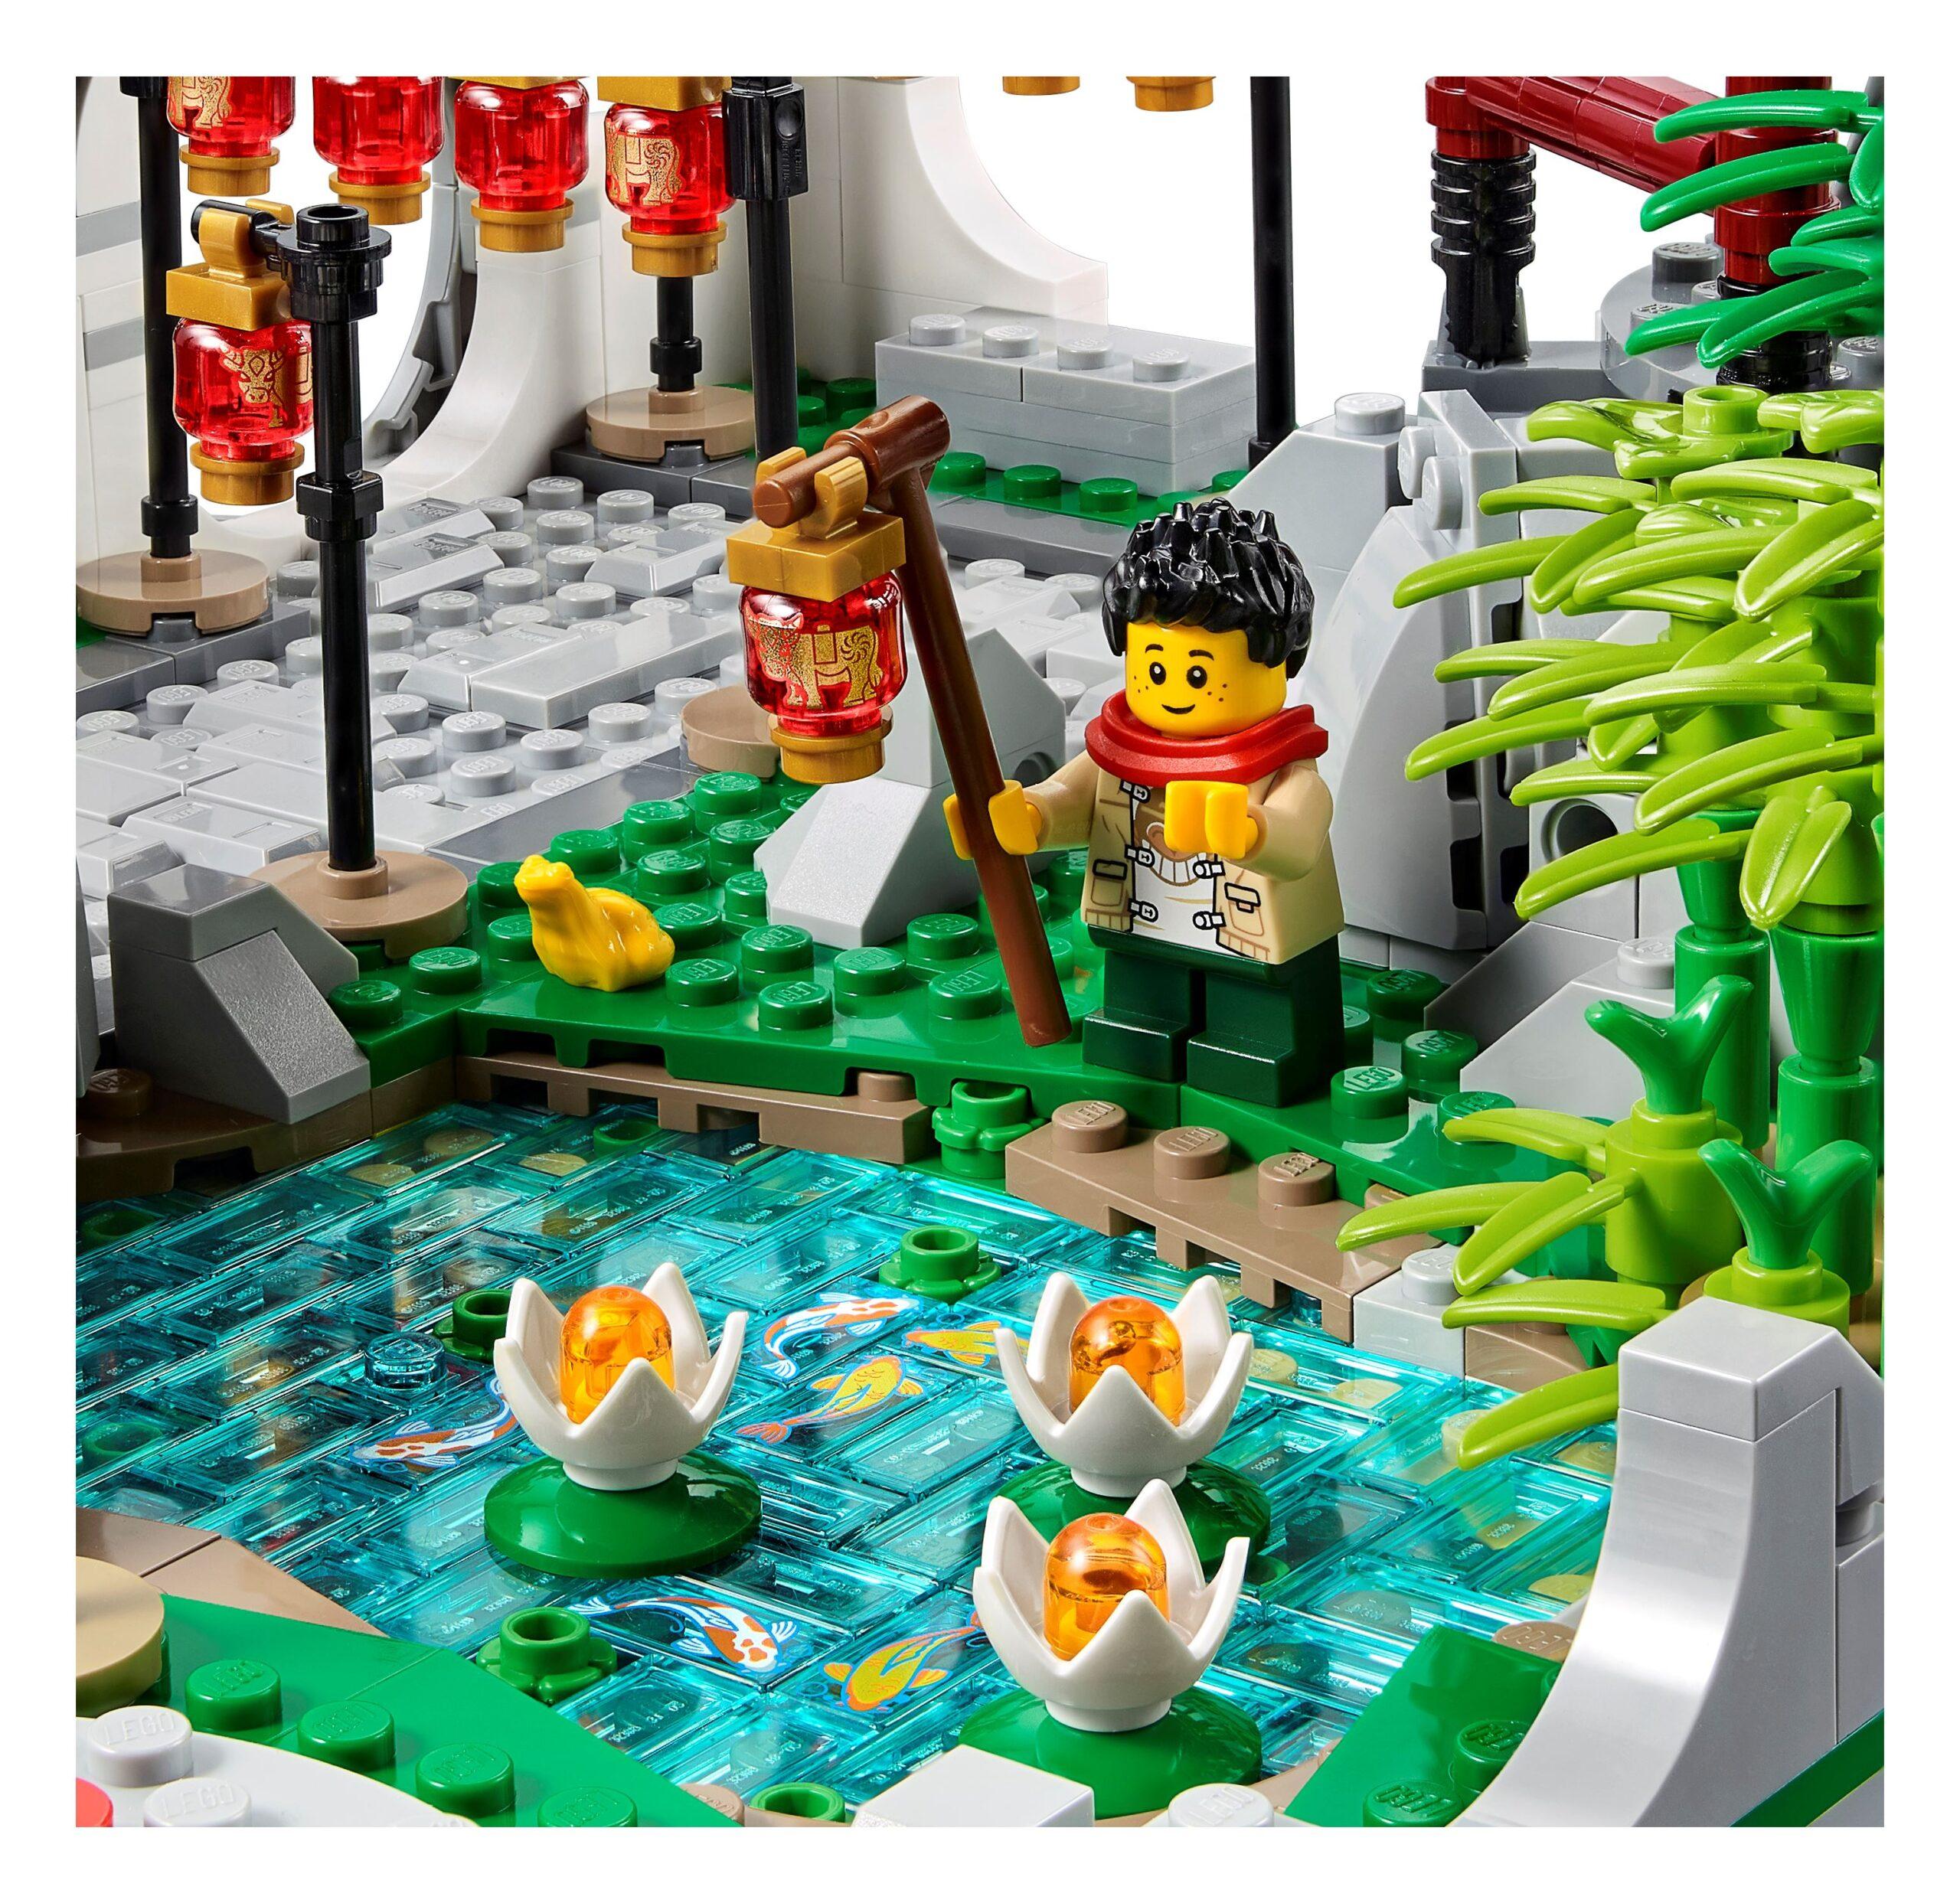 LEGO-80107-Spring-Lantern-Festival-8-scaled.jpg